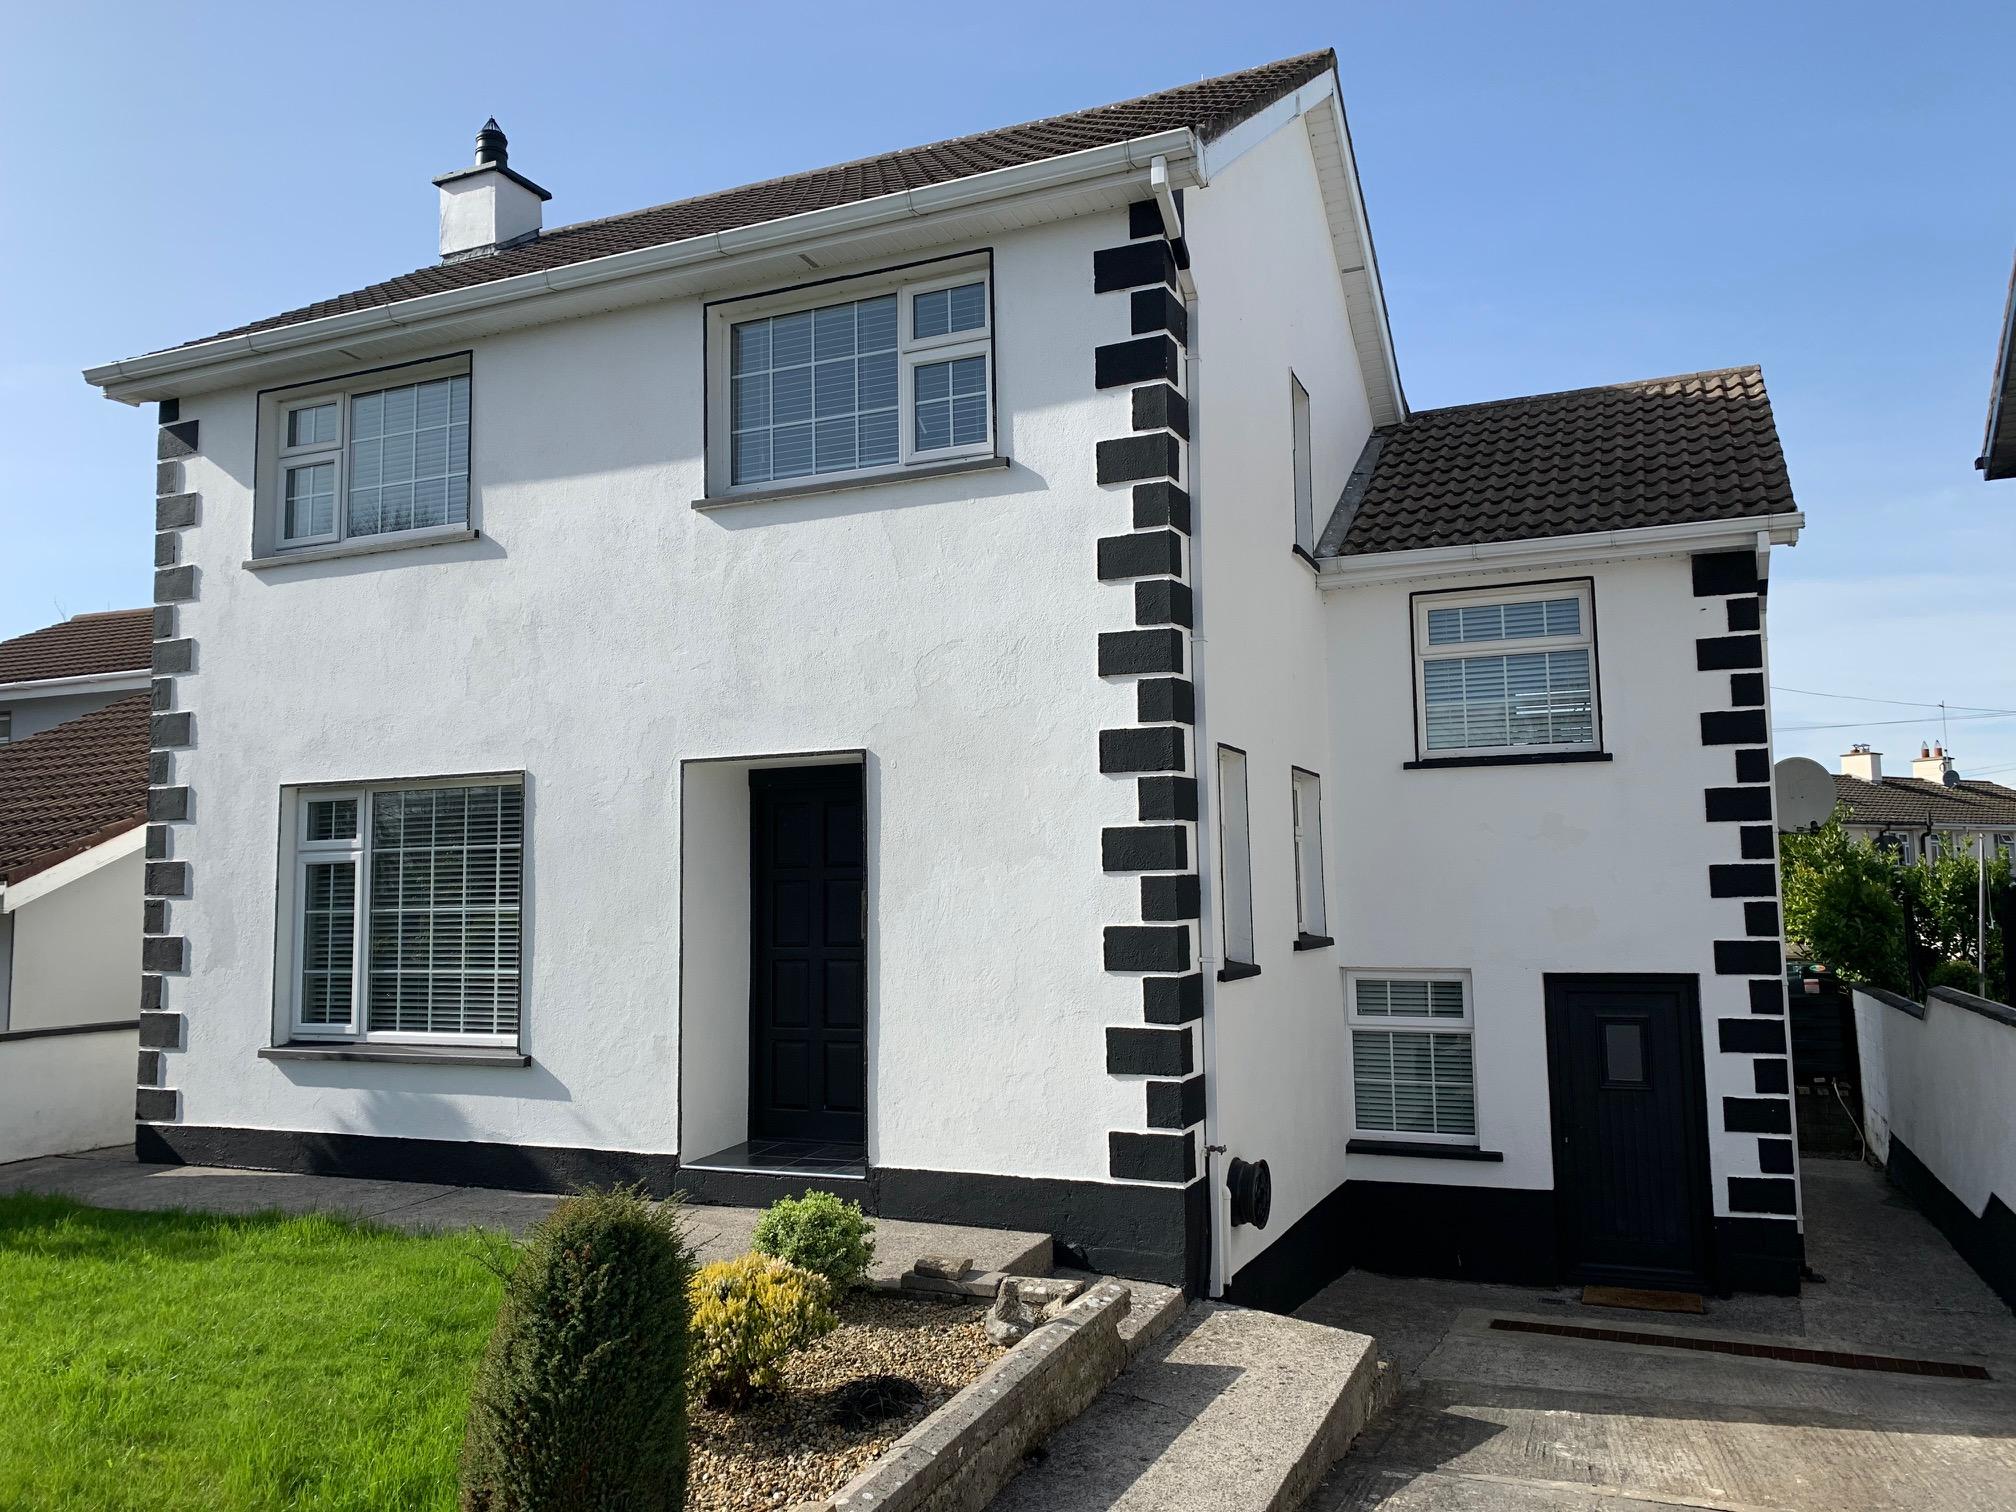 6 Kilcornan, Clarinbridge, Co. Galway 5 Bed  2 Bath  130 m²  Detached